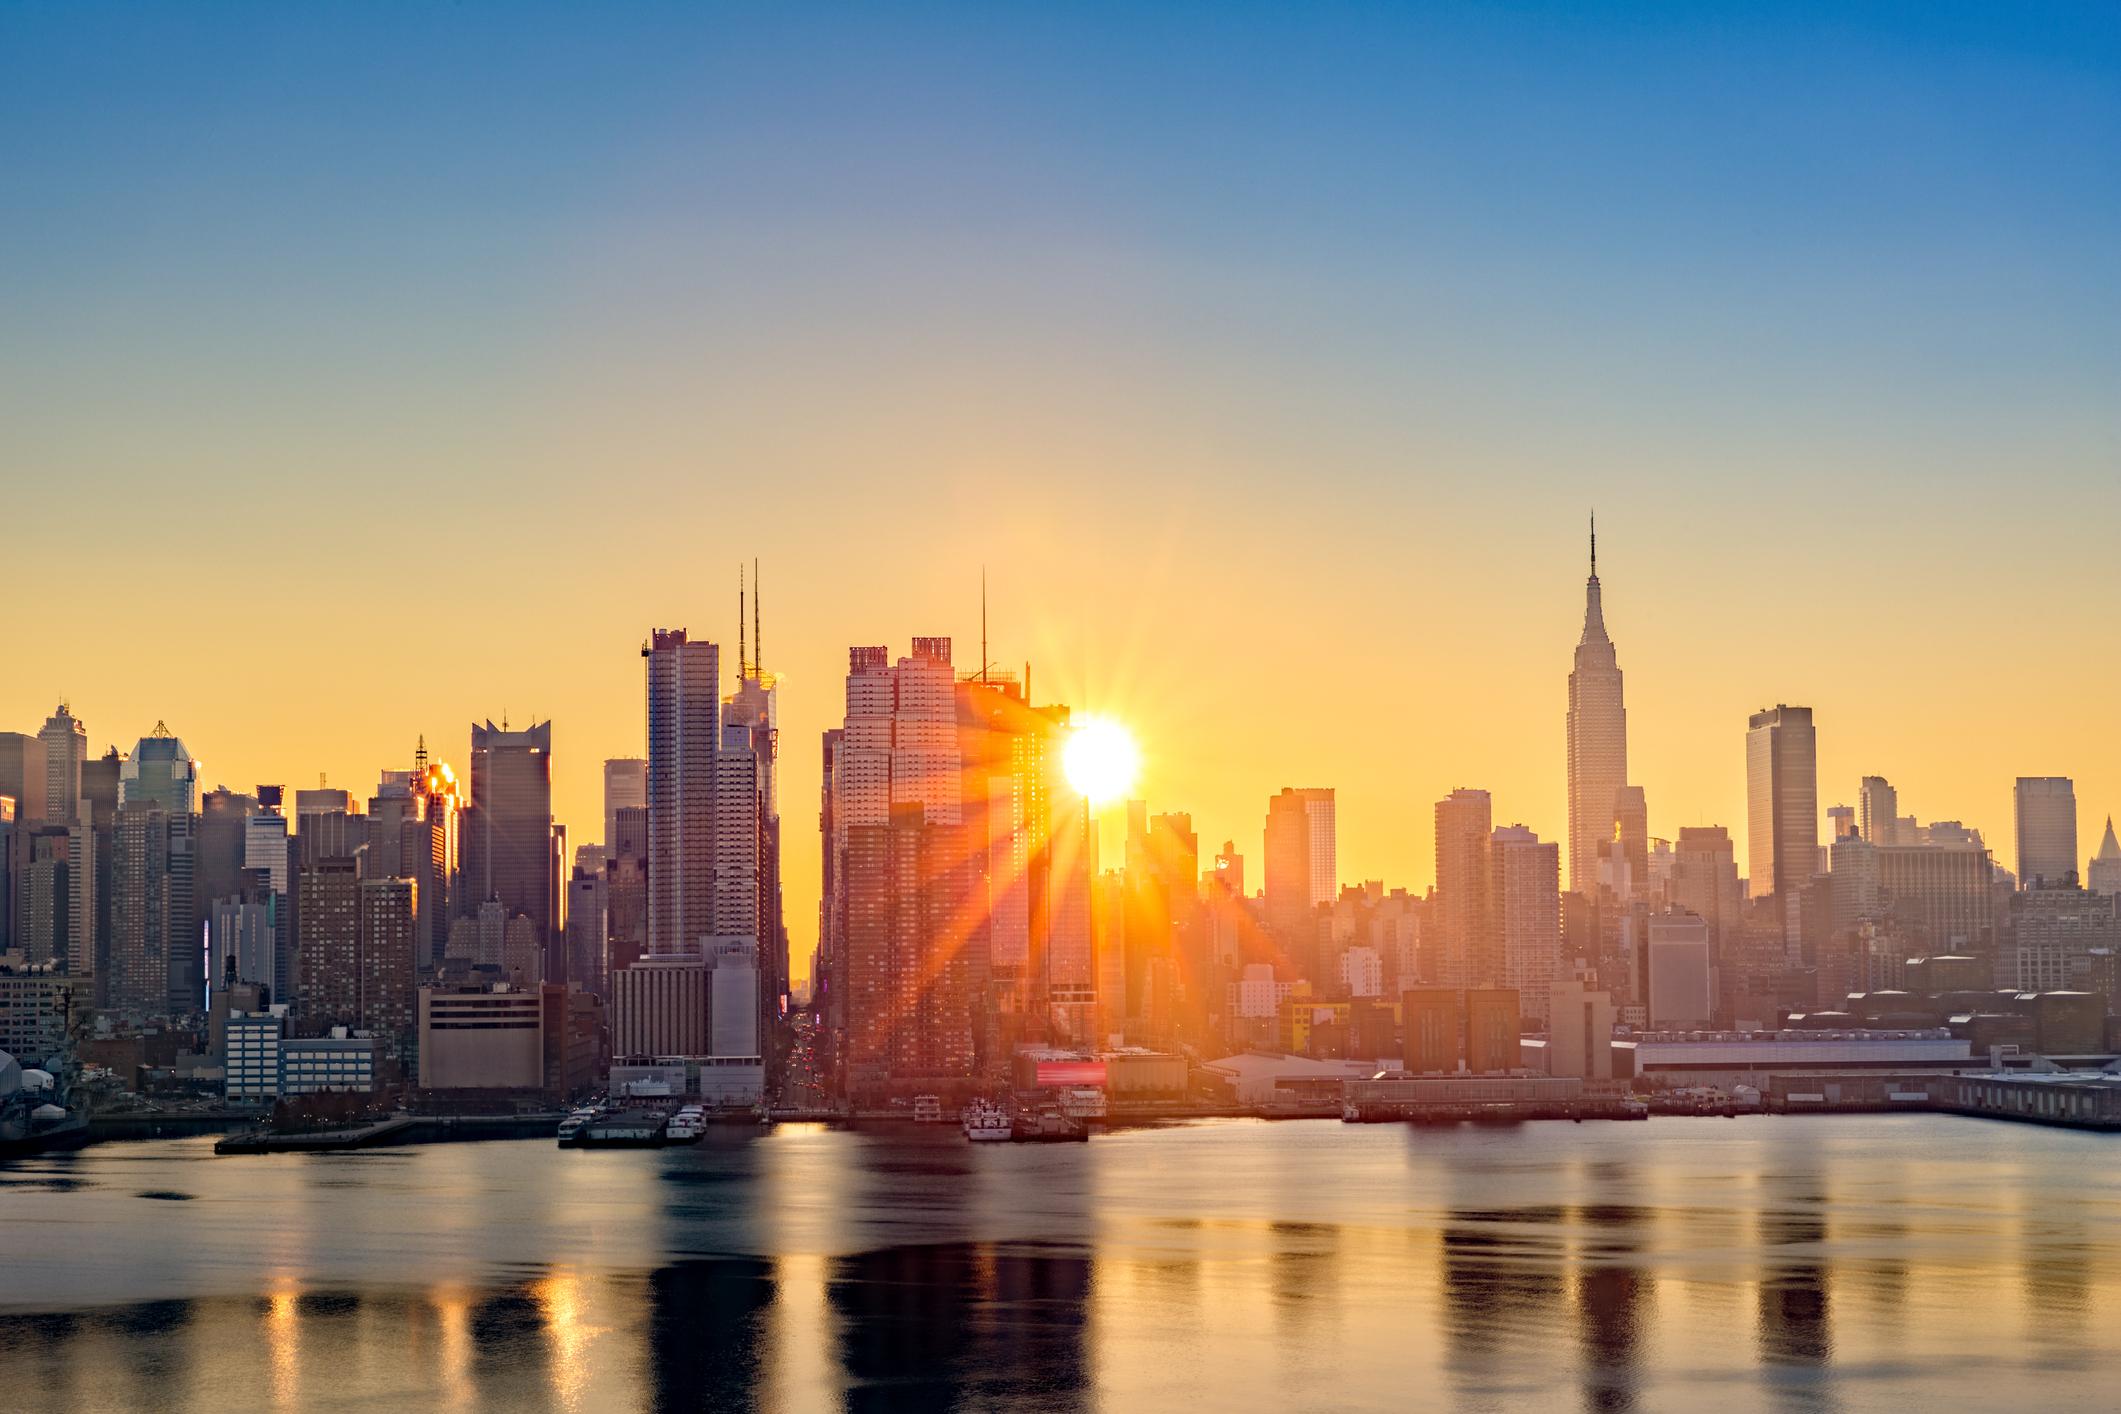 Sunrise over New York City skyline.